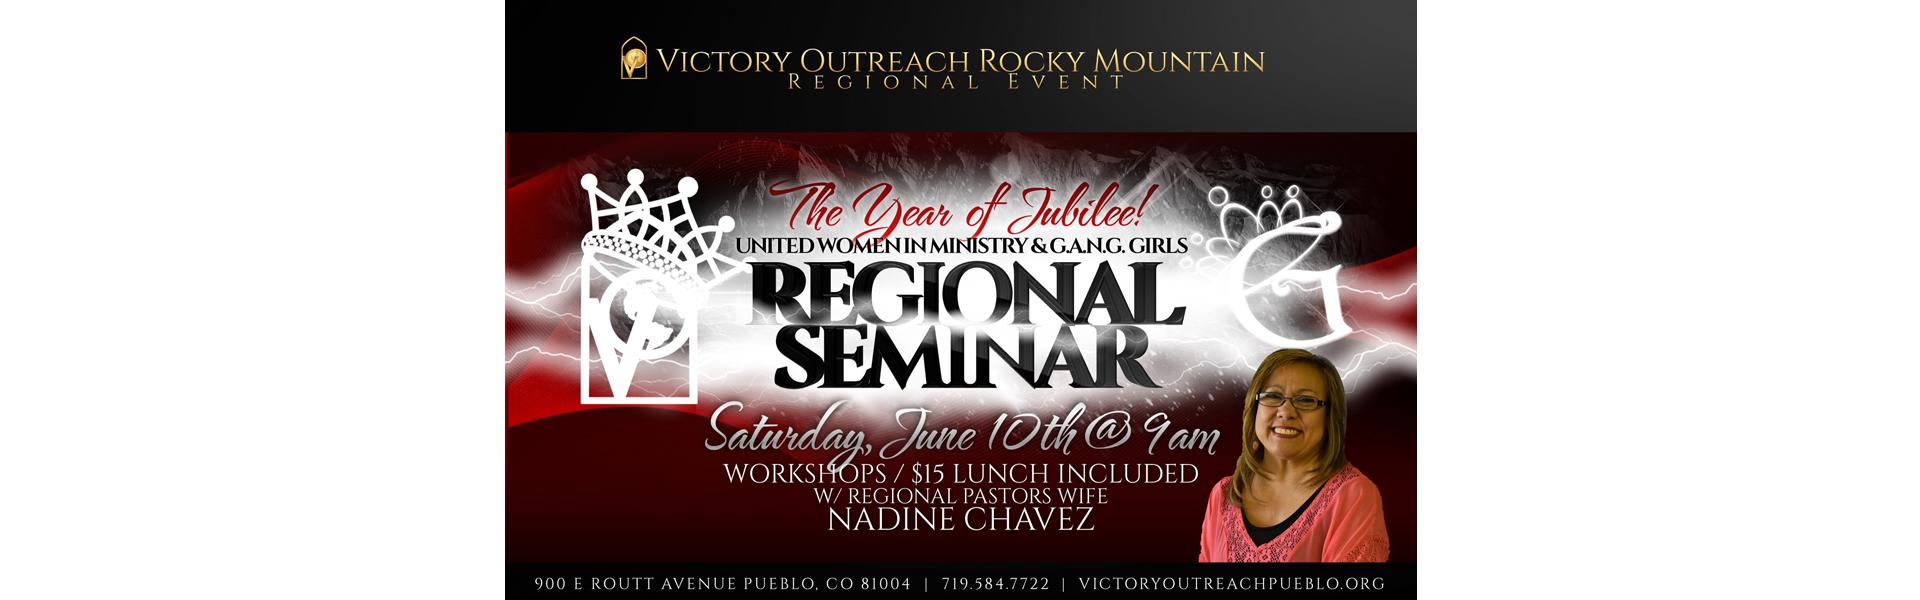 Regional Seminar June 10